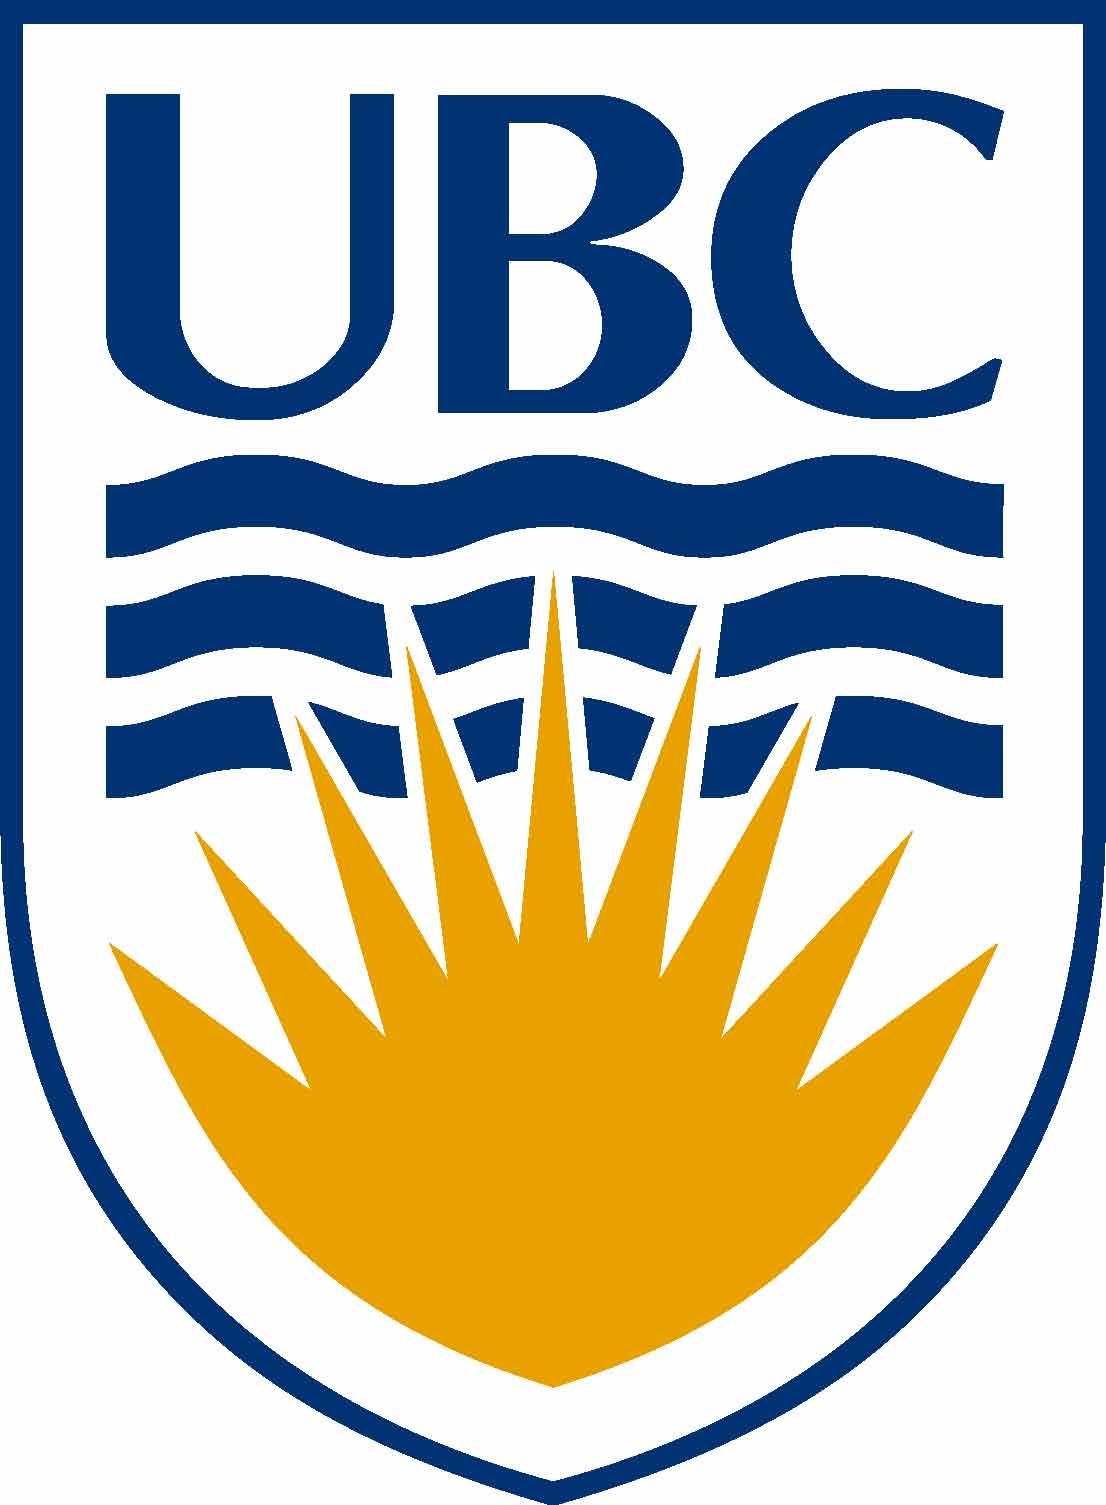 UBC_logo.jpeg